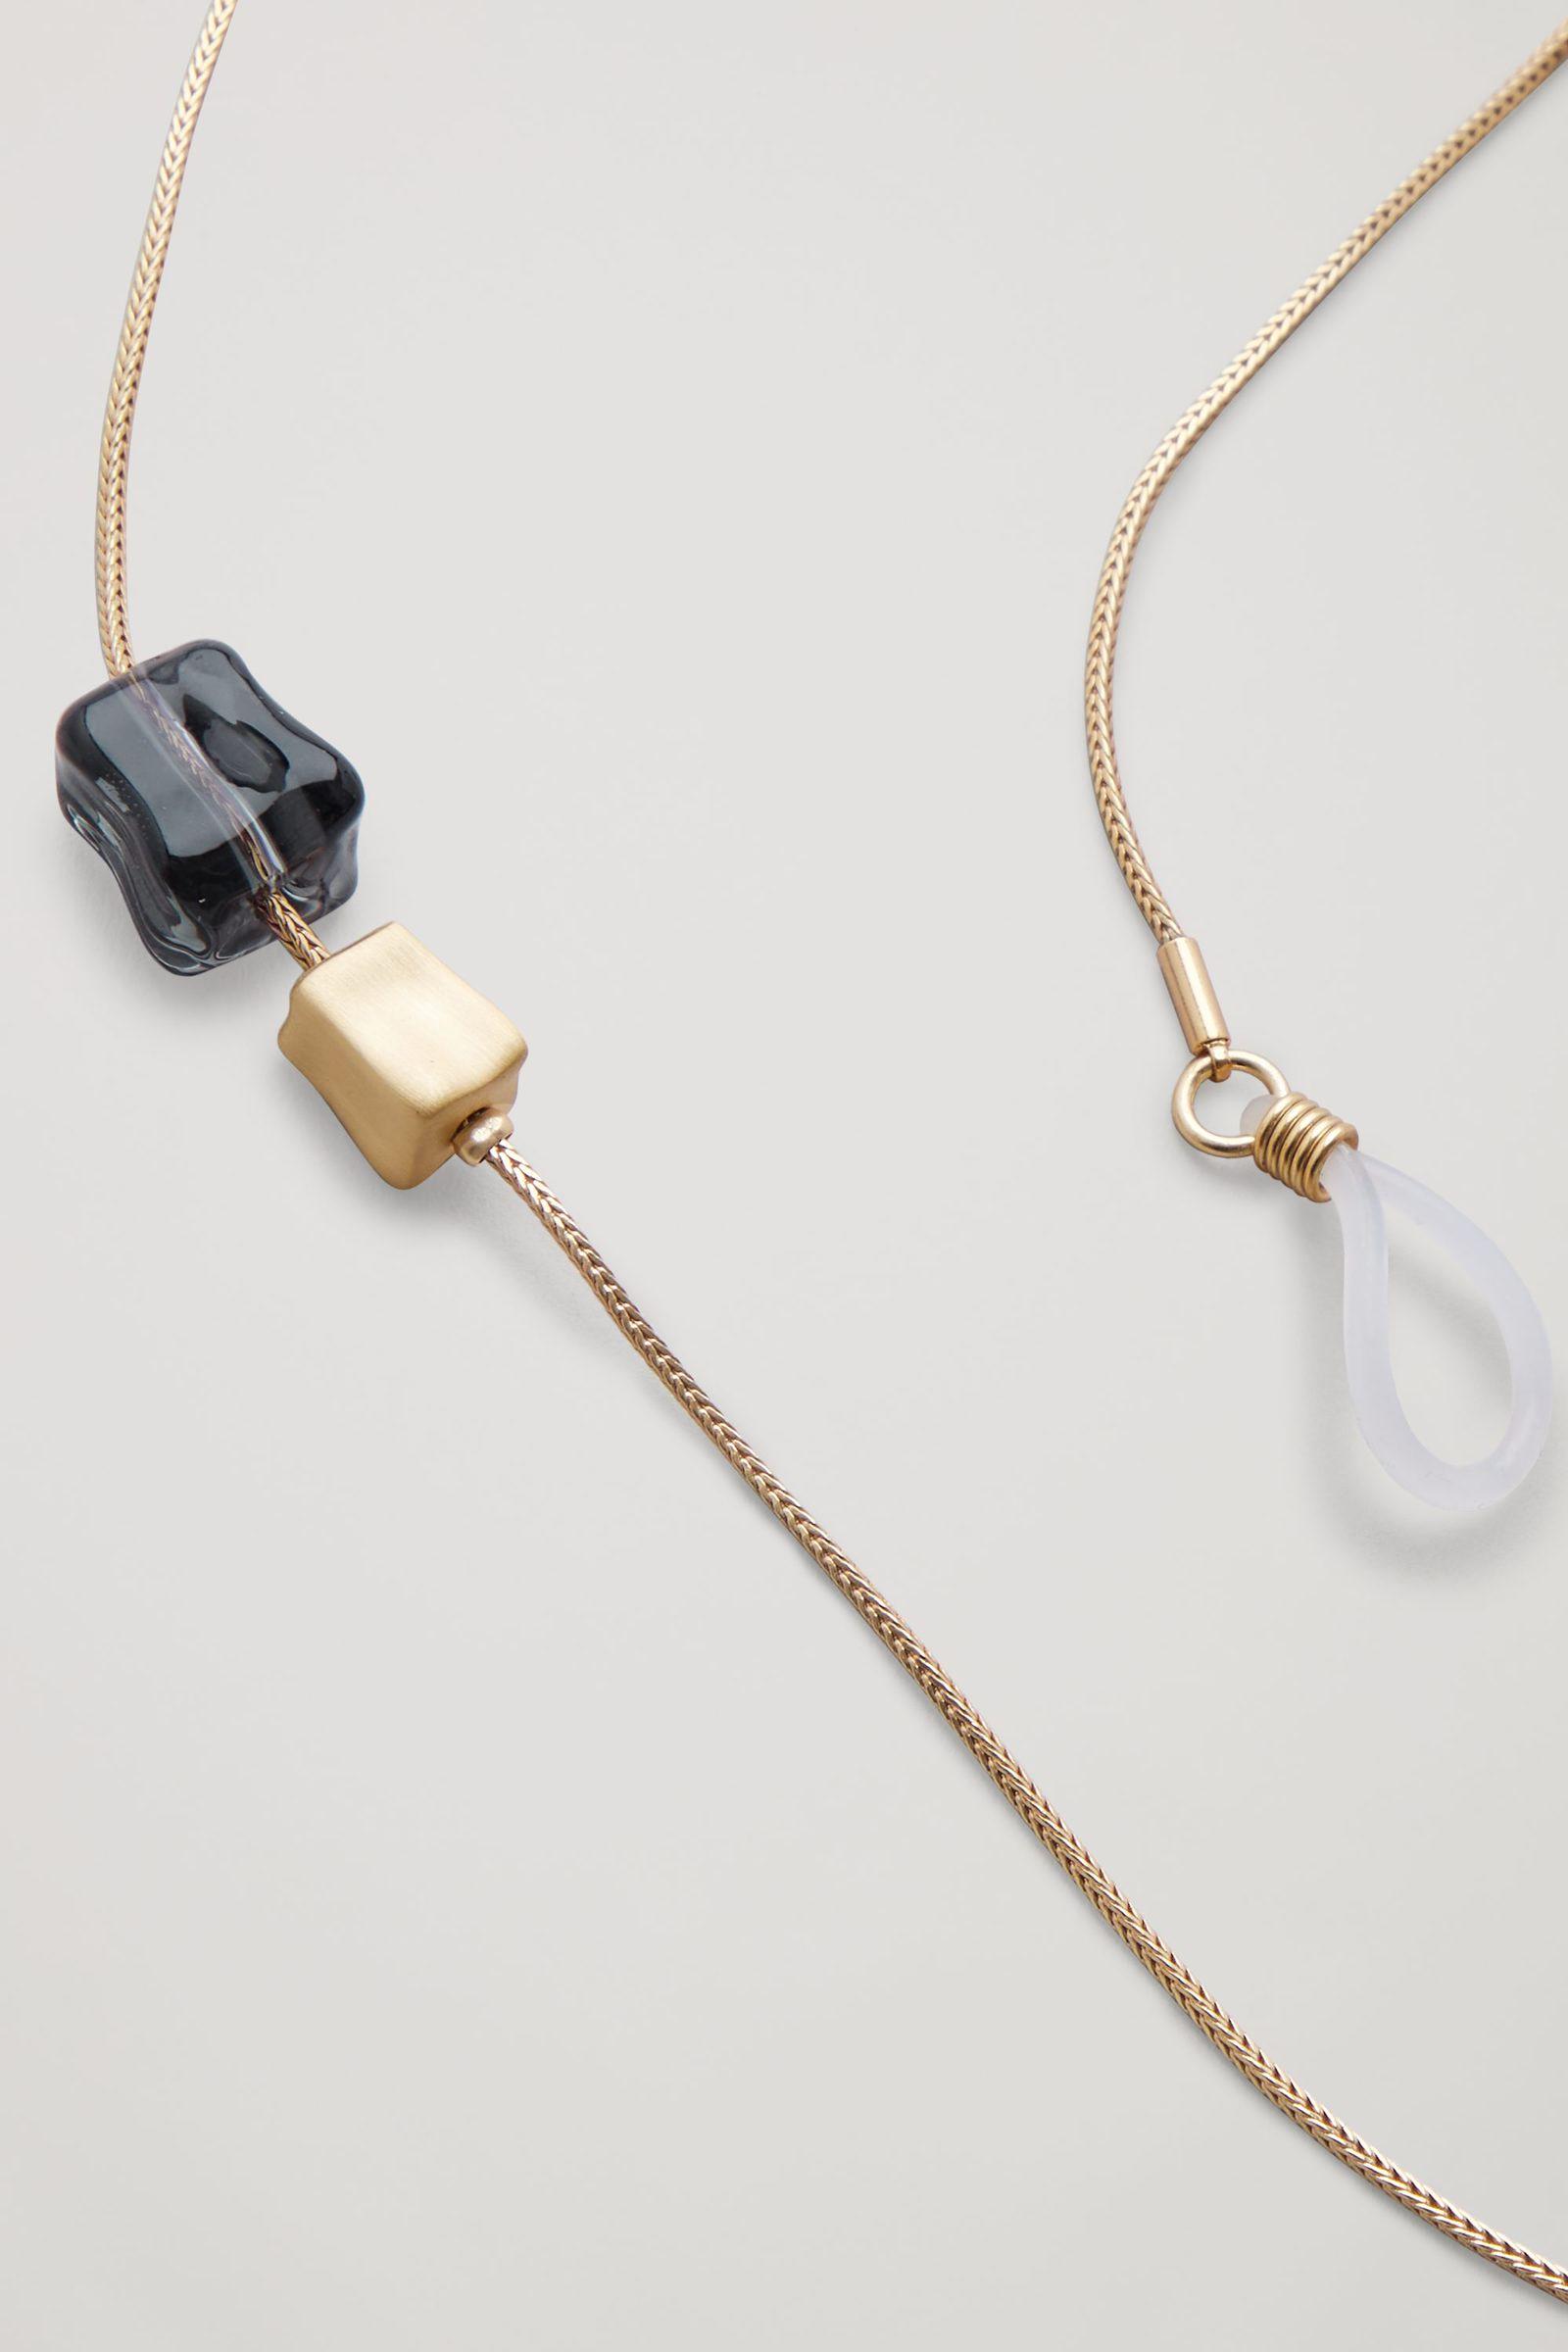 COS 비디드 선글라스 체인의 골드컬러 Detail입니다.